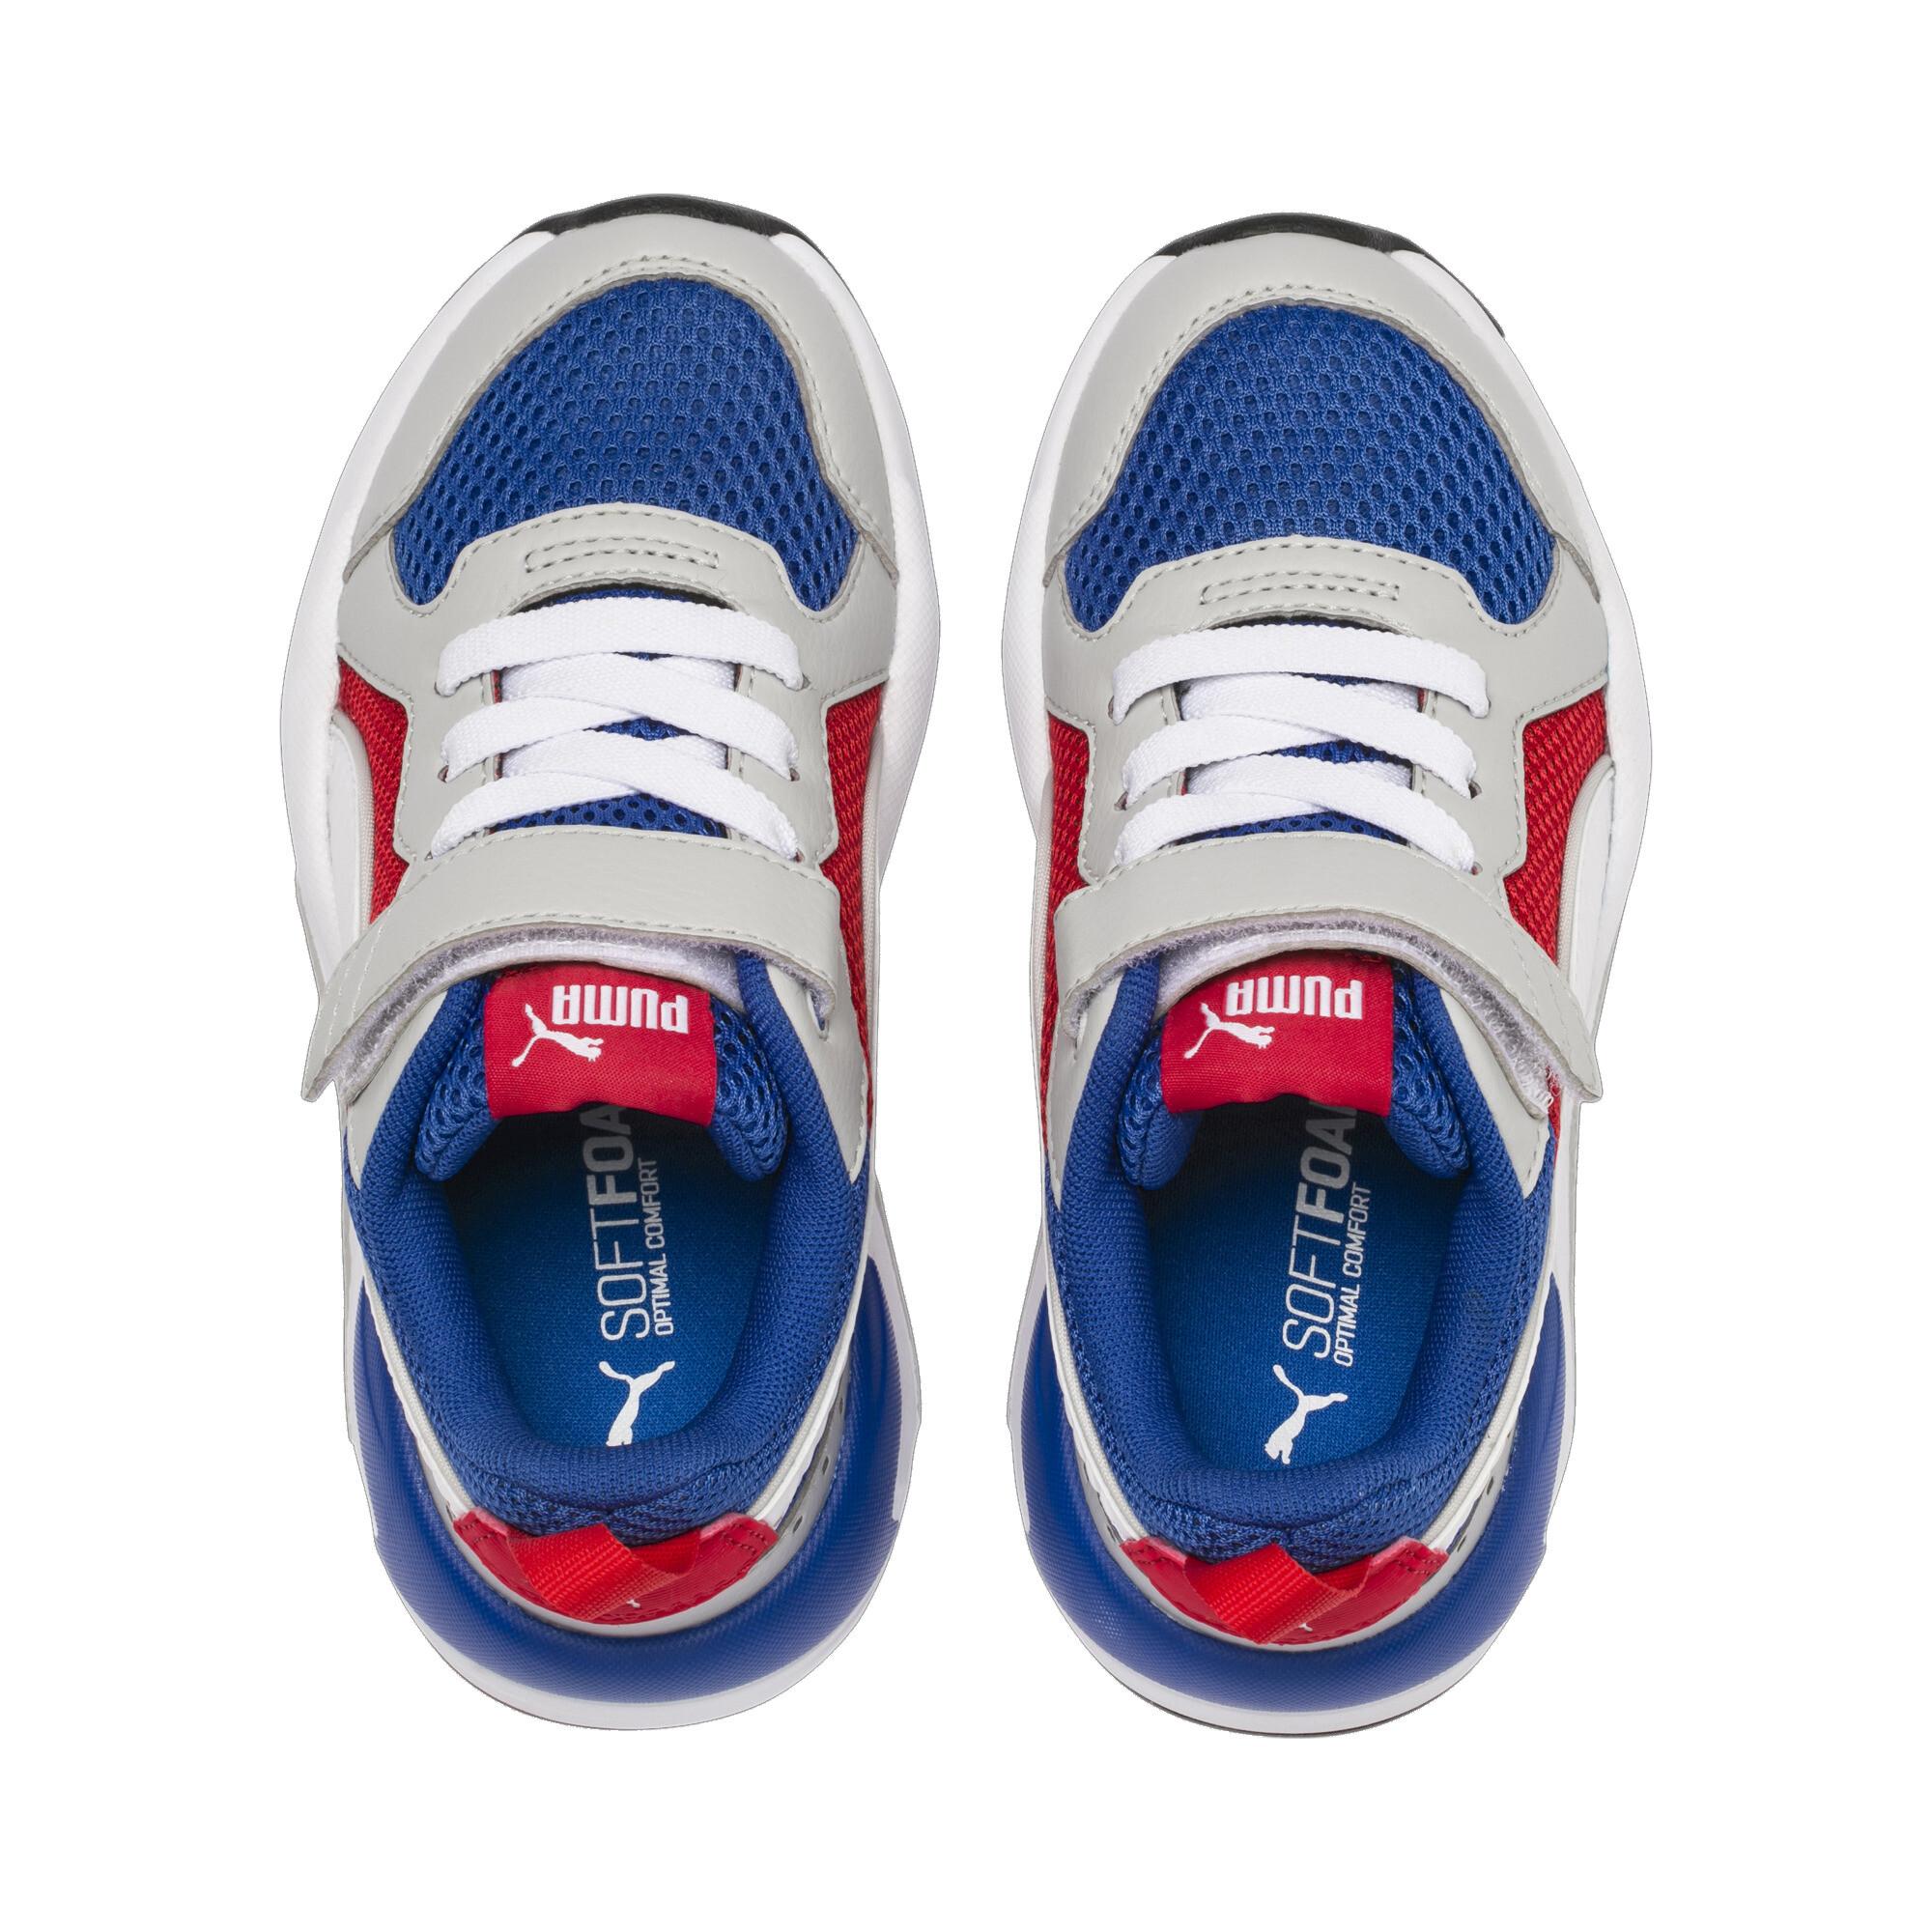 PUMA-X-RAY-Little-Kids-039-Shoes-Kids-Shoe-Kids thumbnail 19